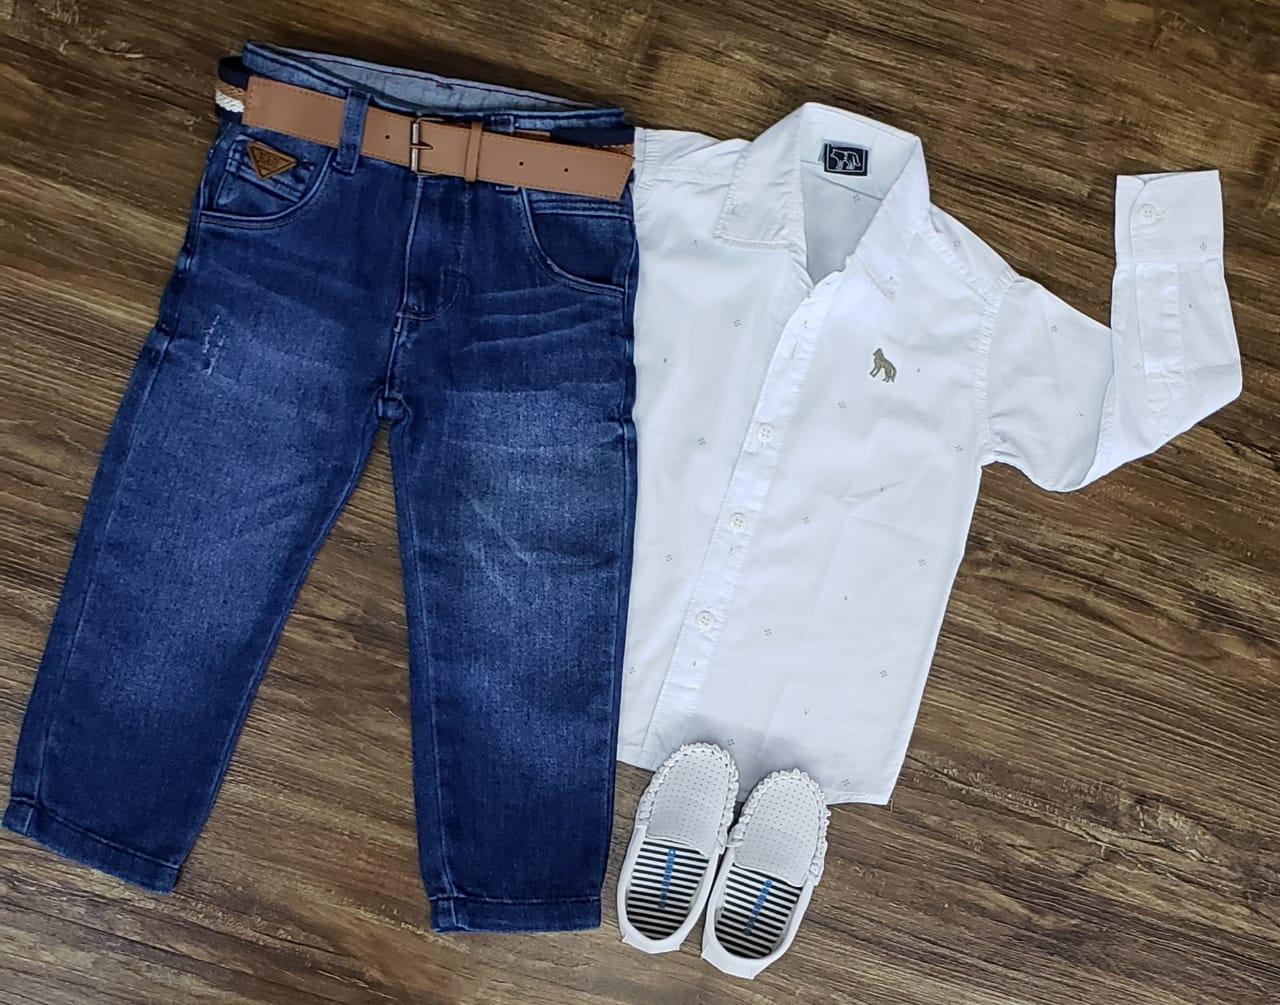 Calça Jeans com Camisa Branca Manga Longa